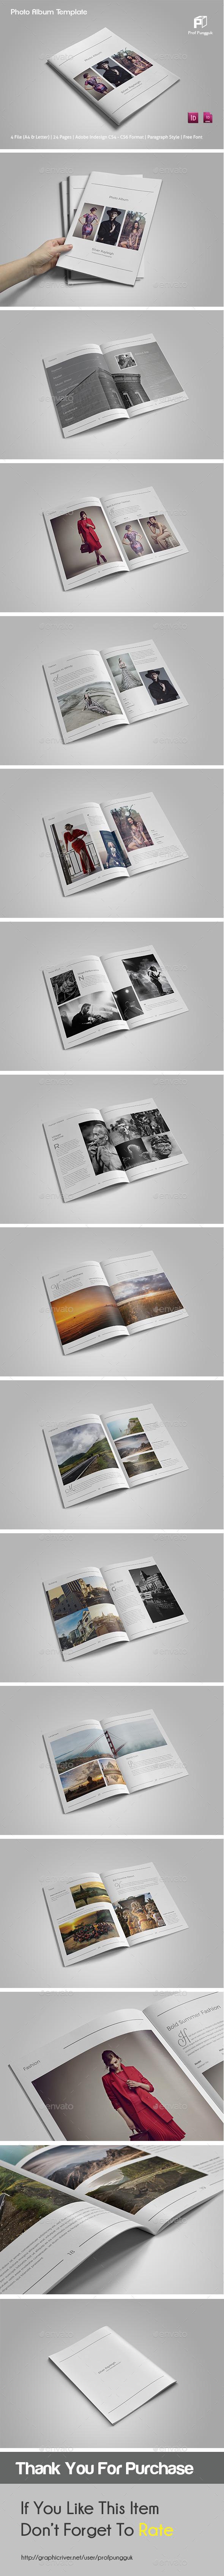 Simple Photo Album Template - Photo Albums Print Templates